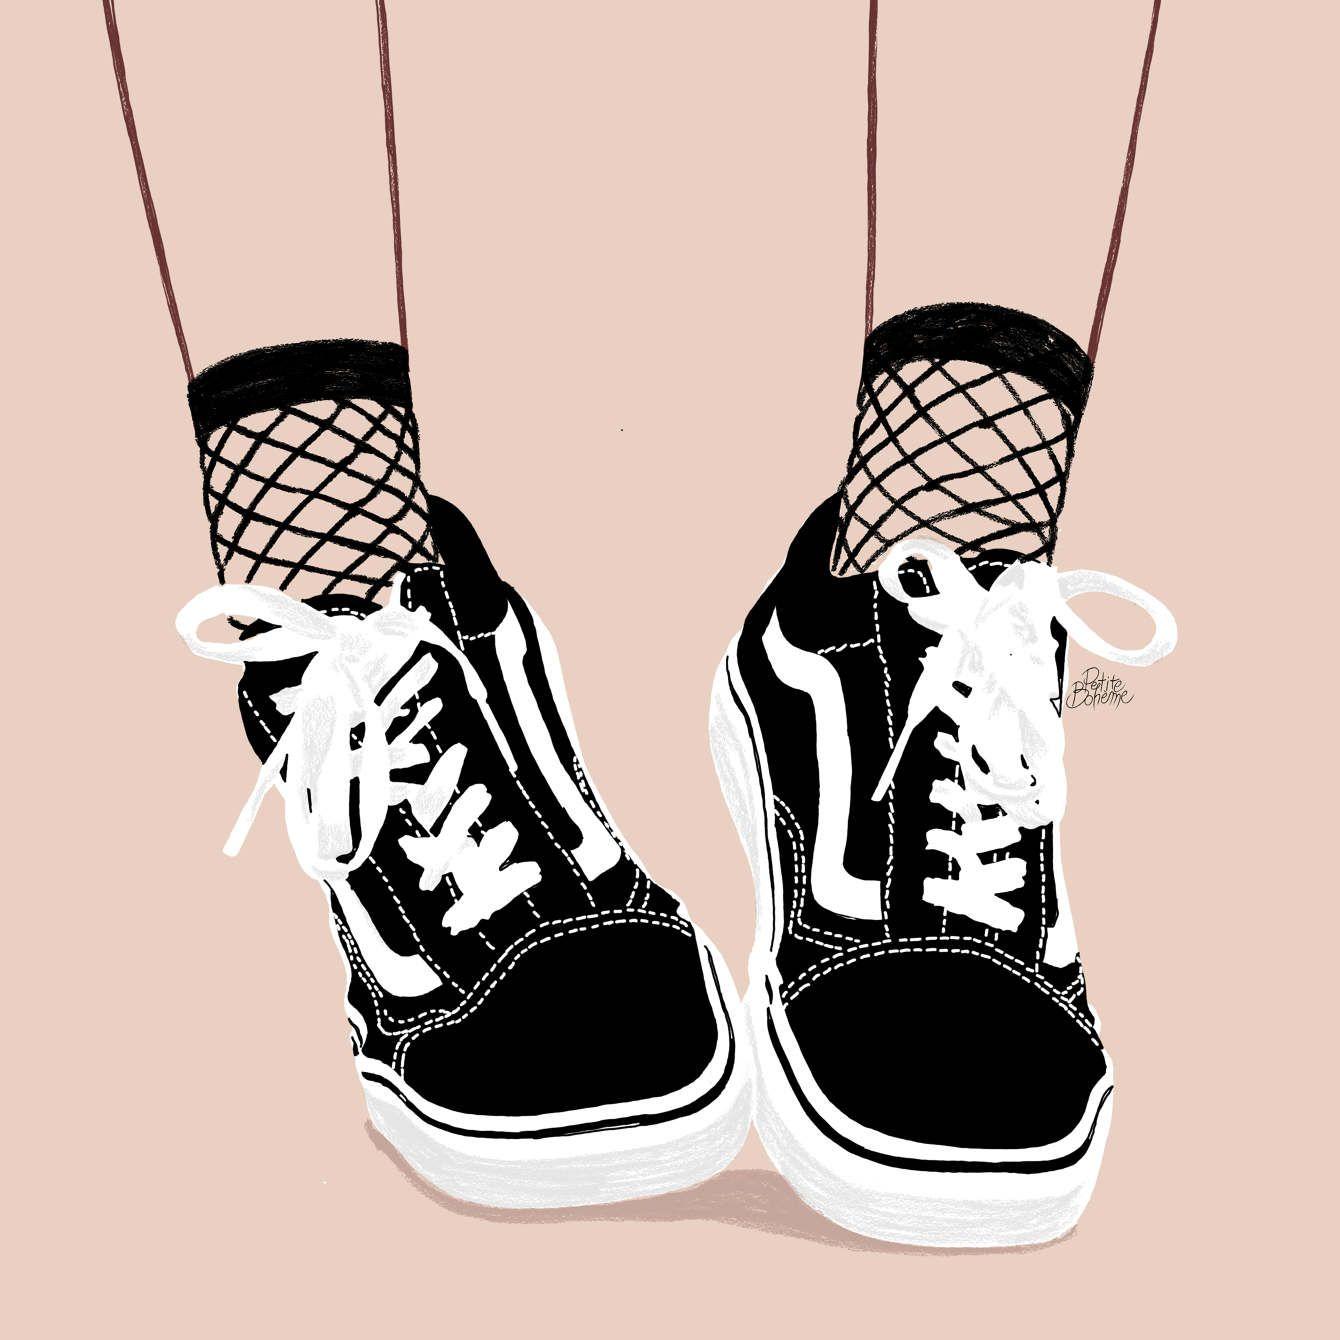 Vans C Shoes Wallpaper Cute Wallpapers Shoe Art